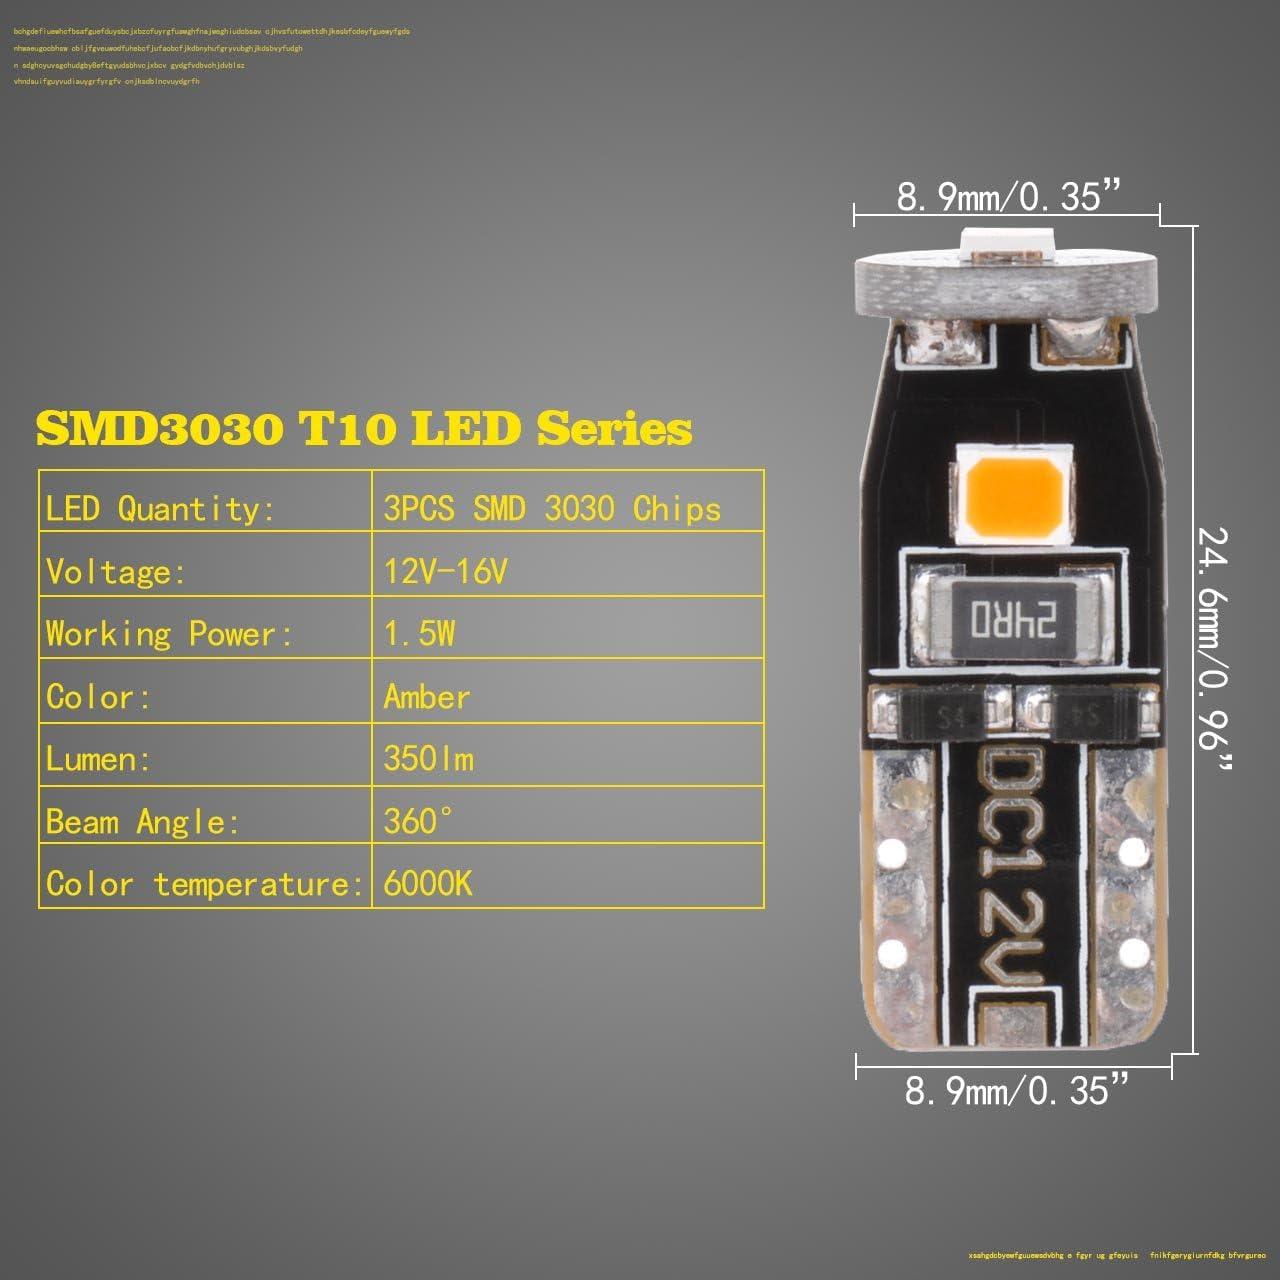 NGCAT 10PCS 450LUMENS Super Luminoso 5630/chipset 6-Ex T10/168/194/2825/175/921/912/lampadine LED Backup luci Tronco Laterali luci 2/W 12/V 6000/K Rosso